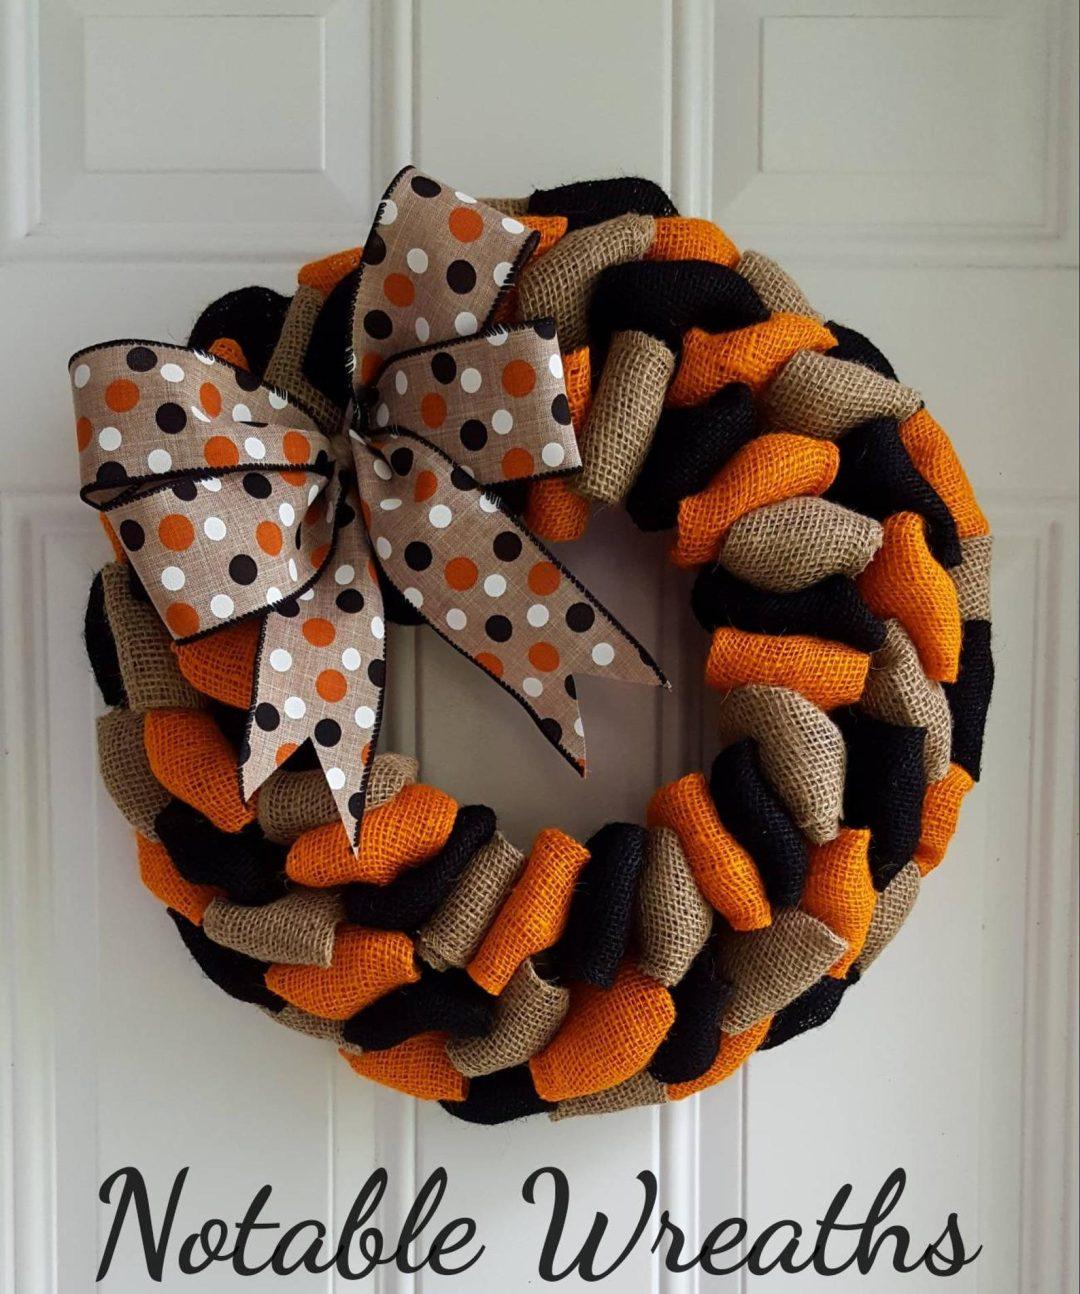 Black and orange burlap Halloween wreaths